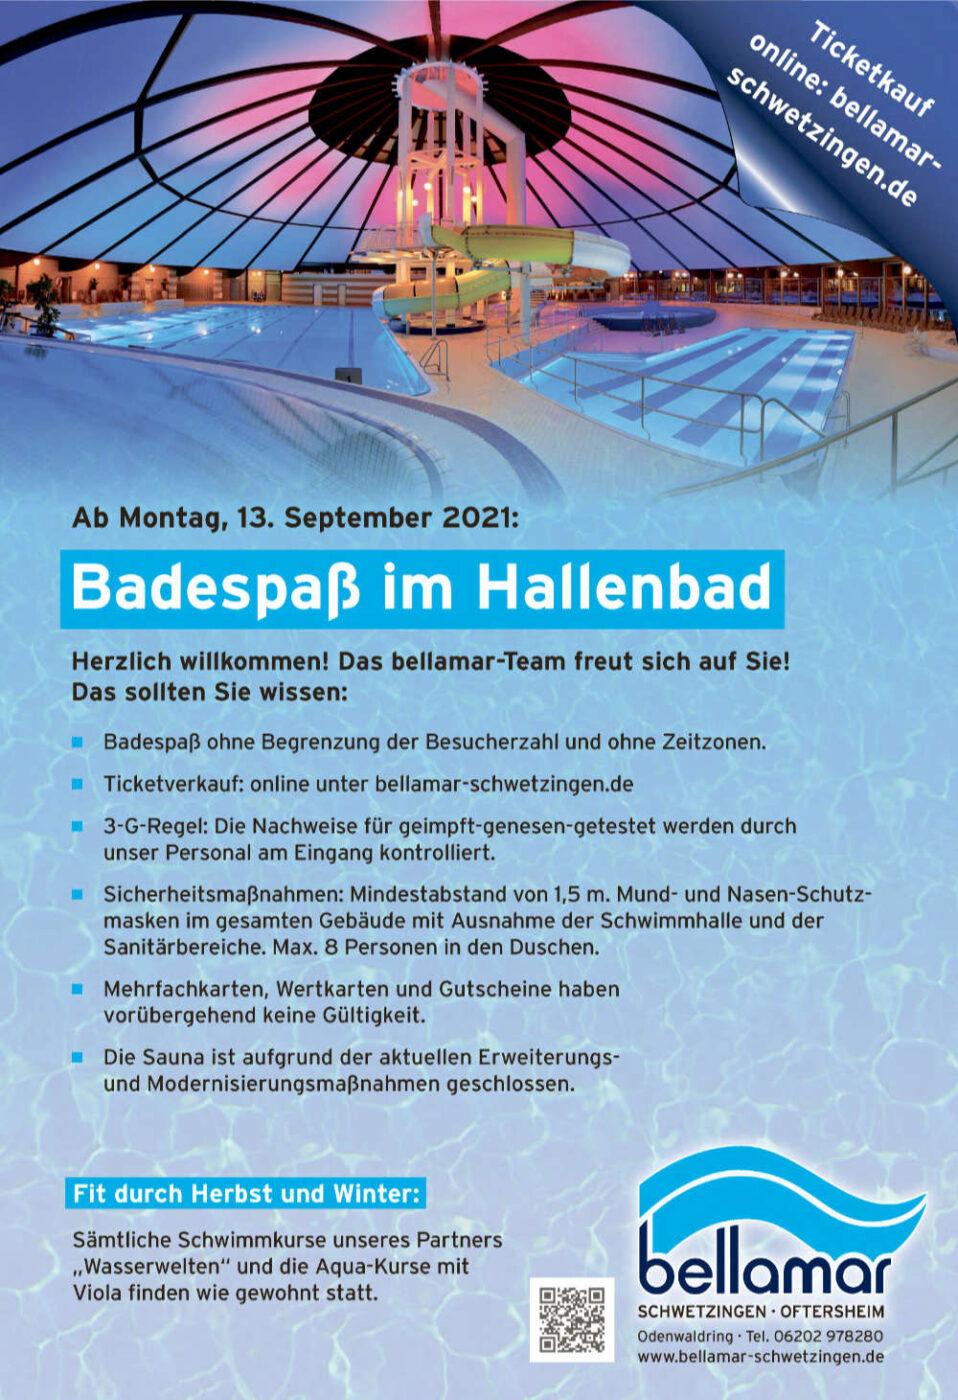 Badespaß im Hallenbad ab 13. September 2021